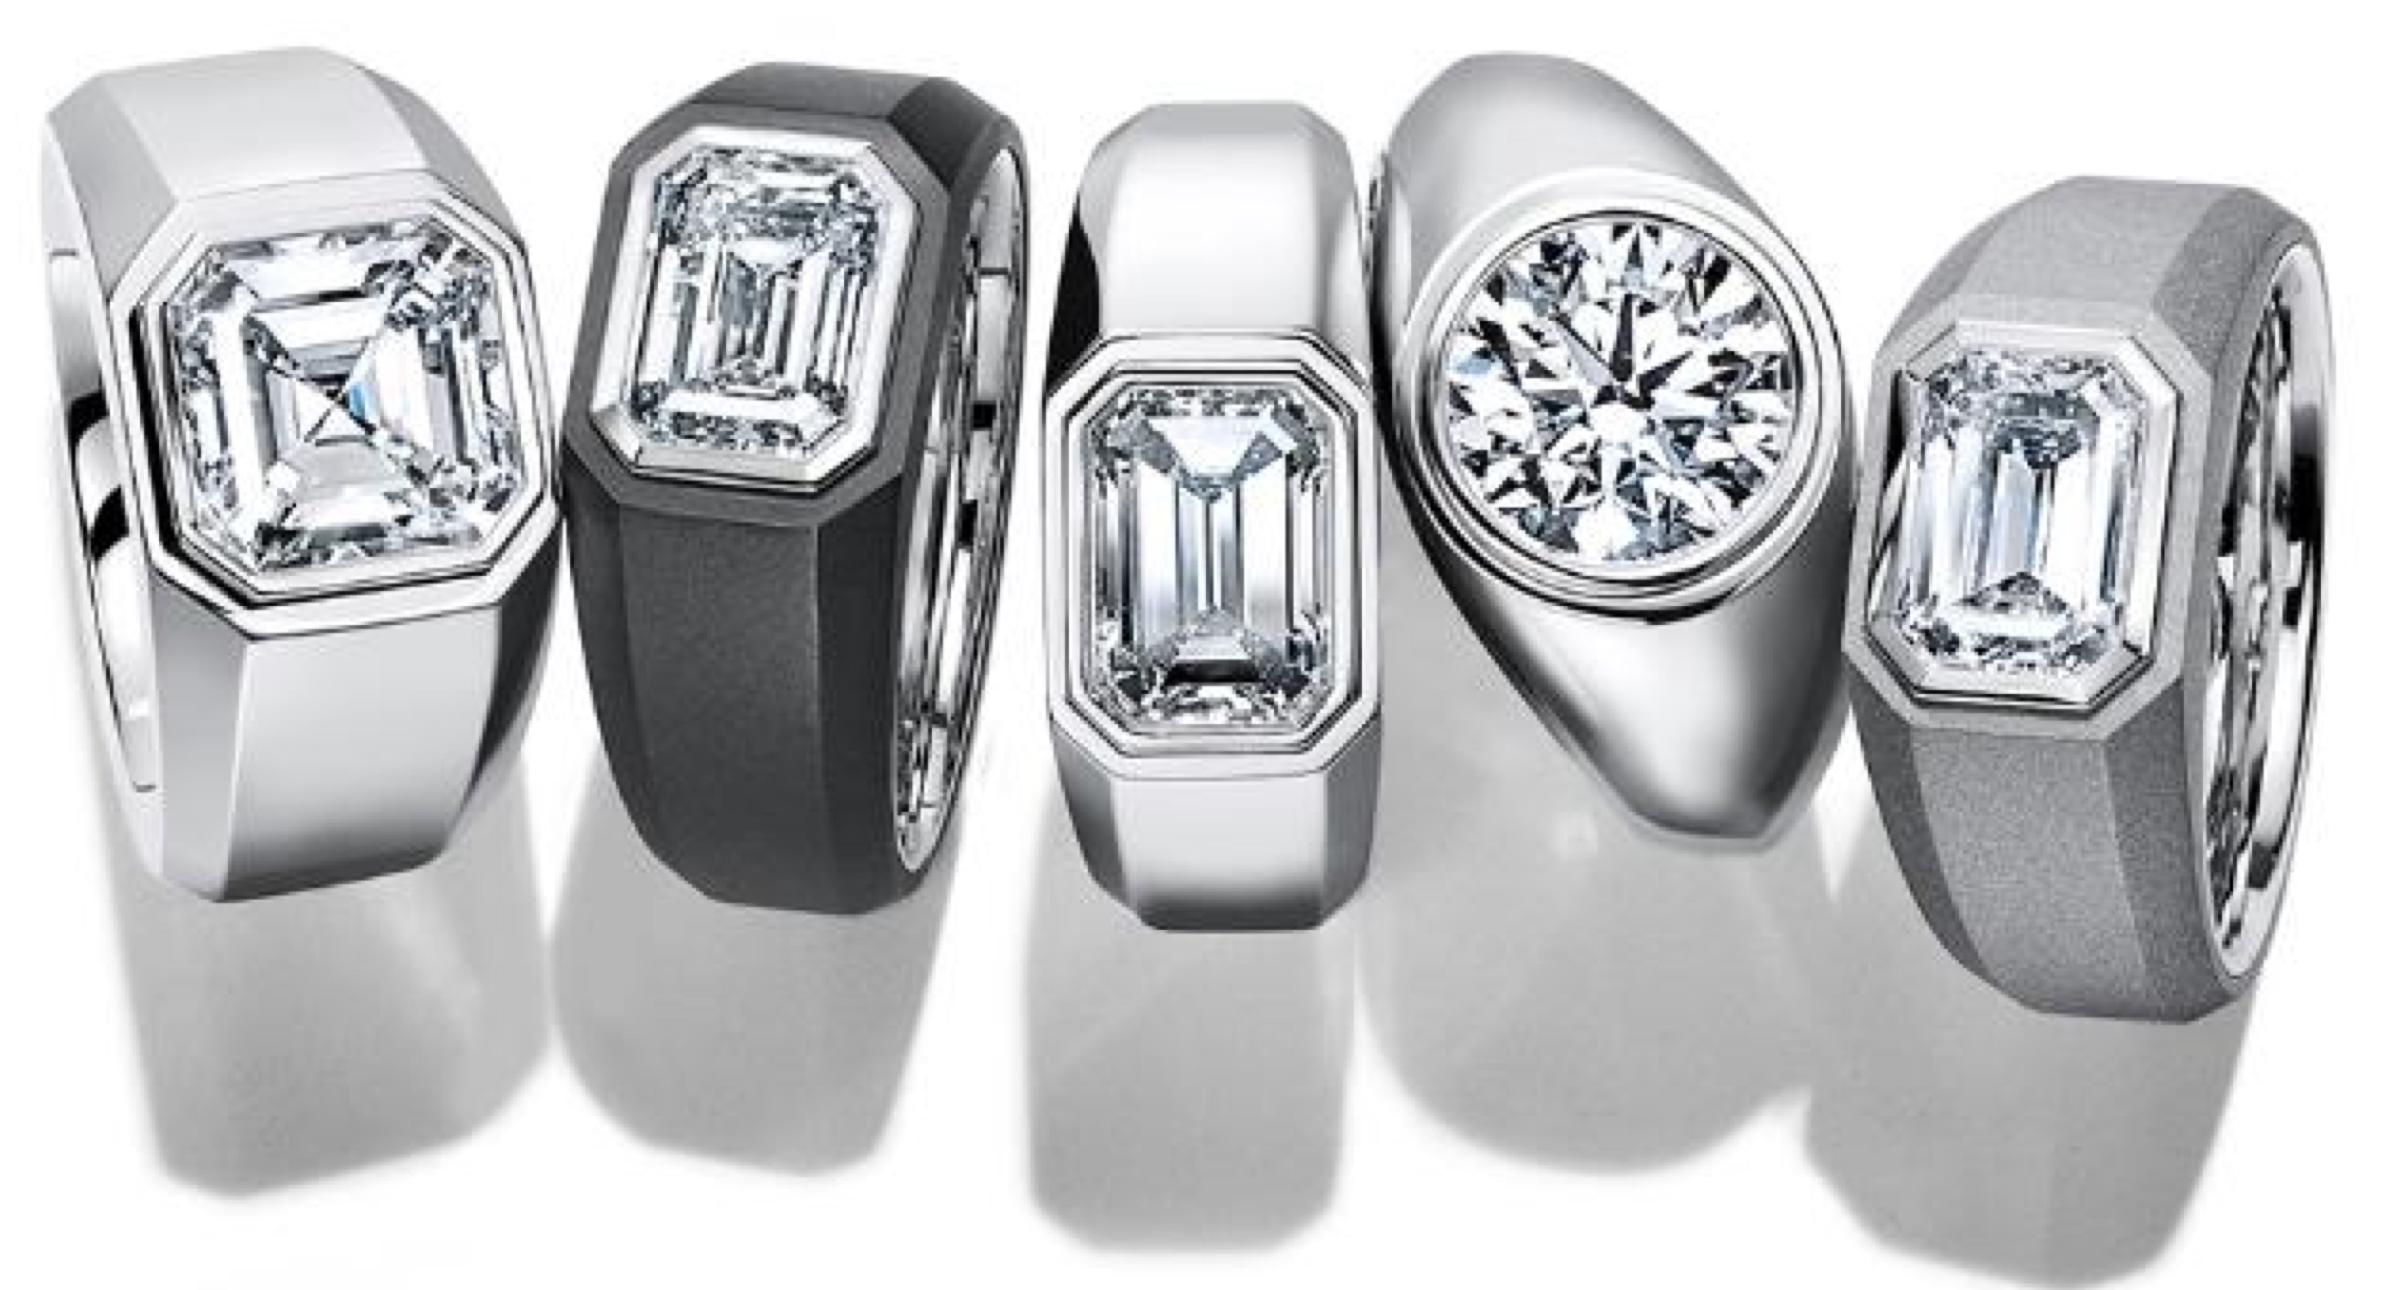 tiffany's new ring design